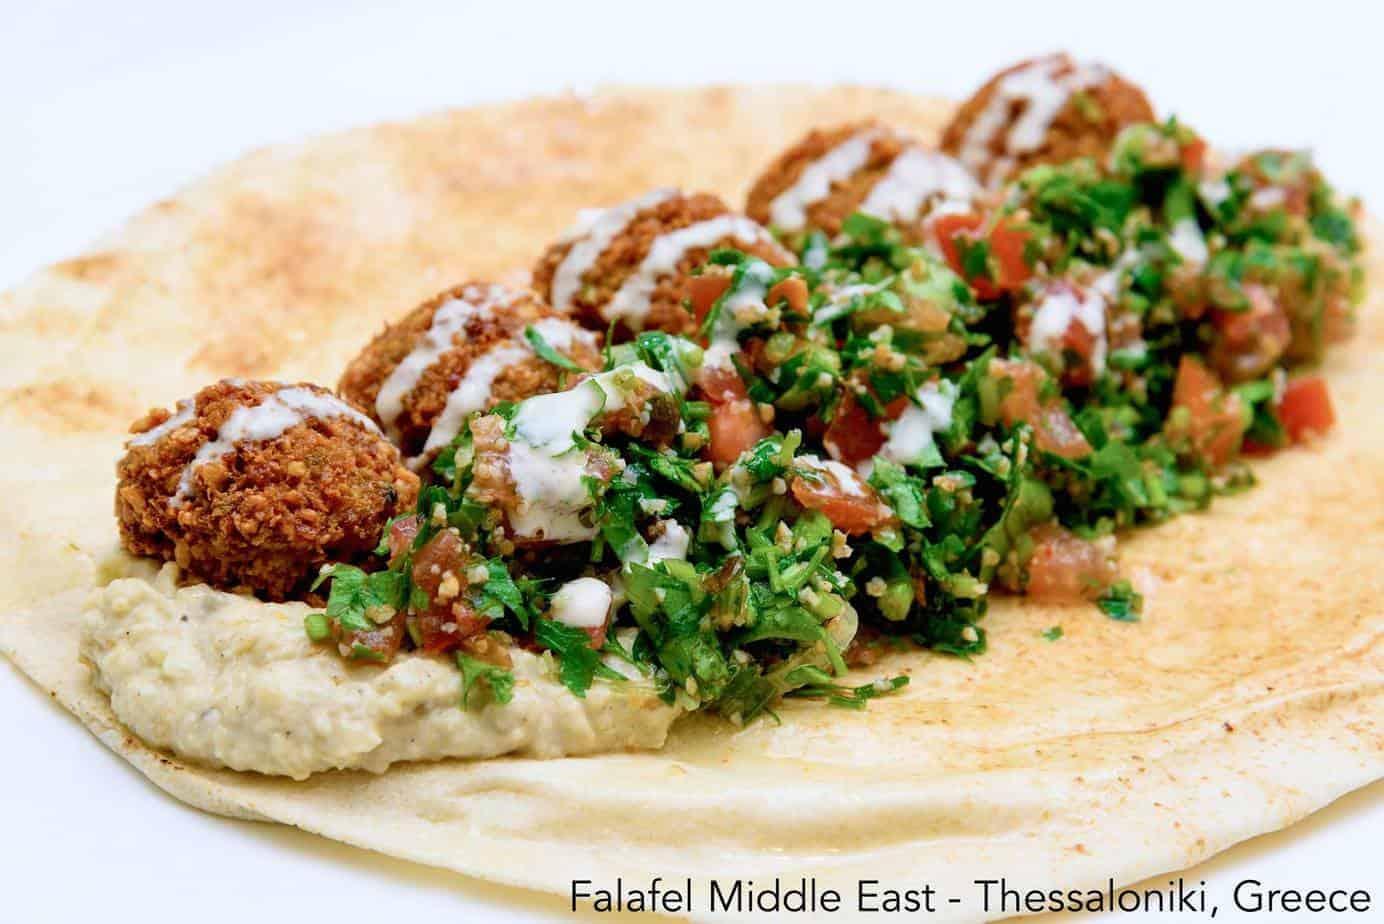 Falafel wrap with veggies and hummus